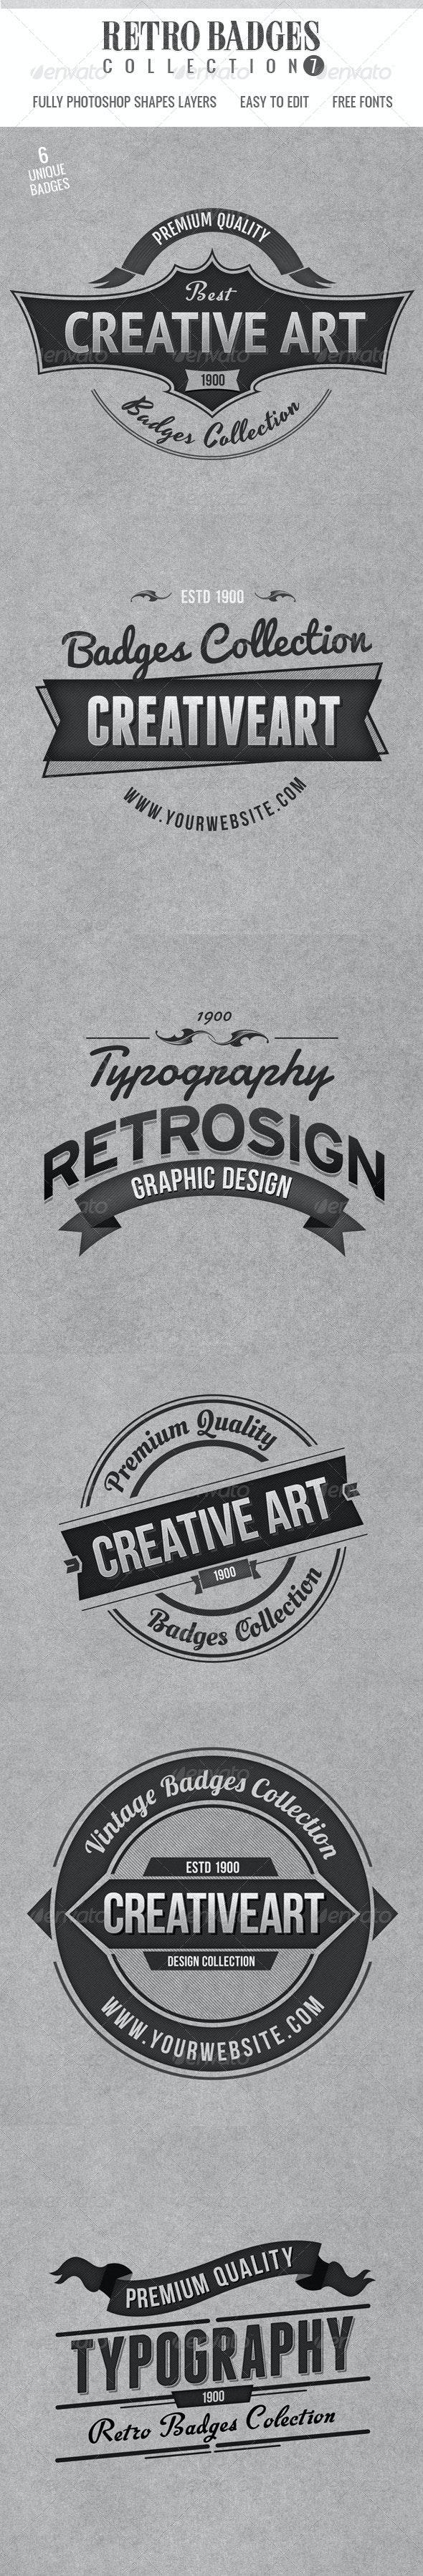 Retro Badges Col 7 - Badges & Stickers Web Elements